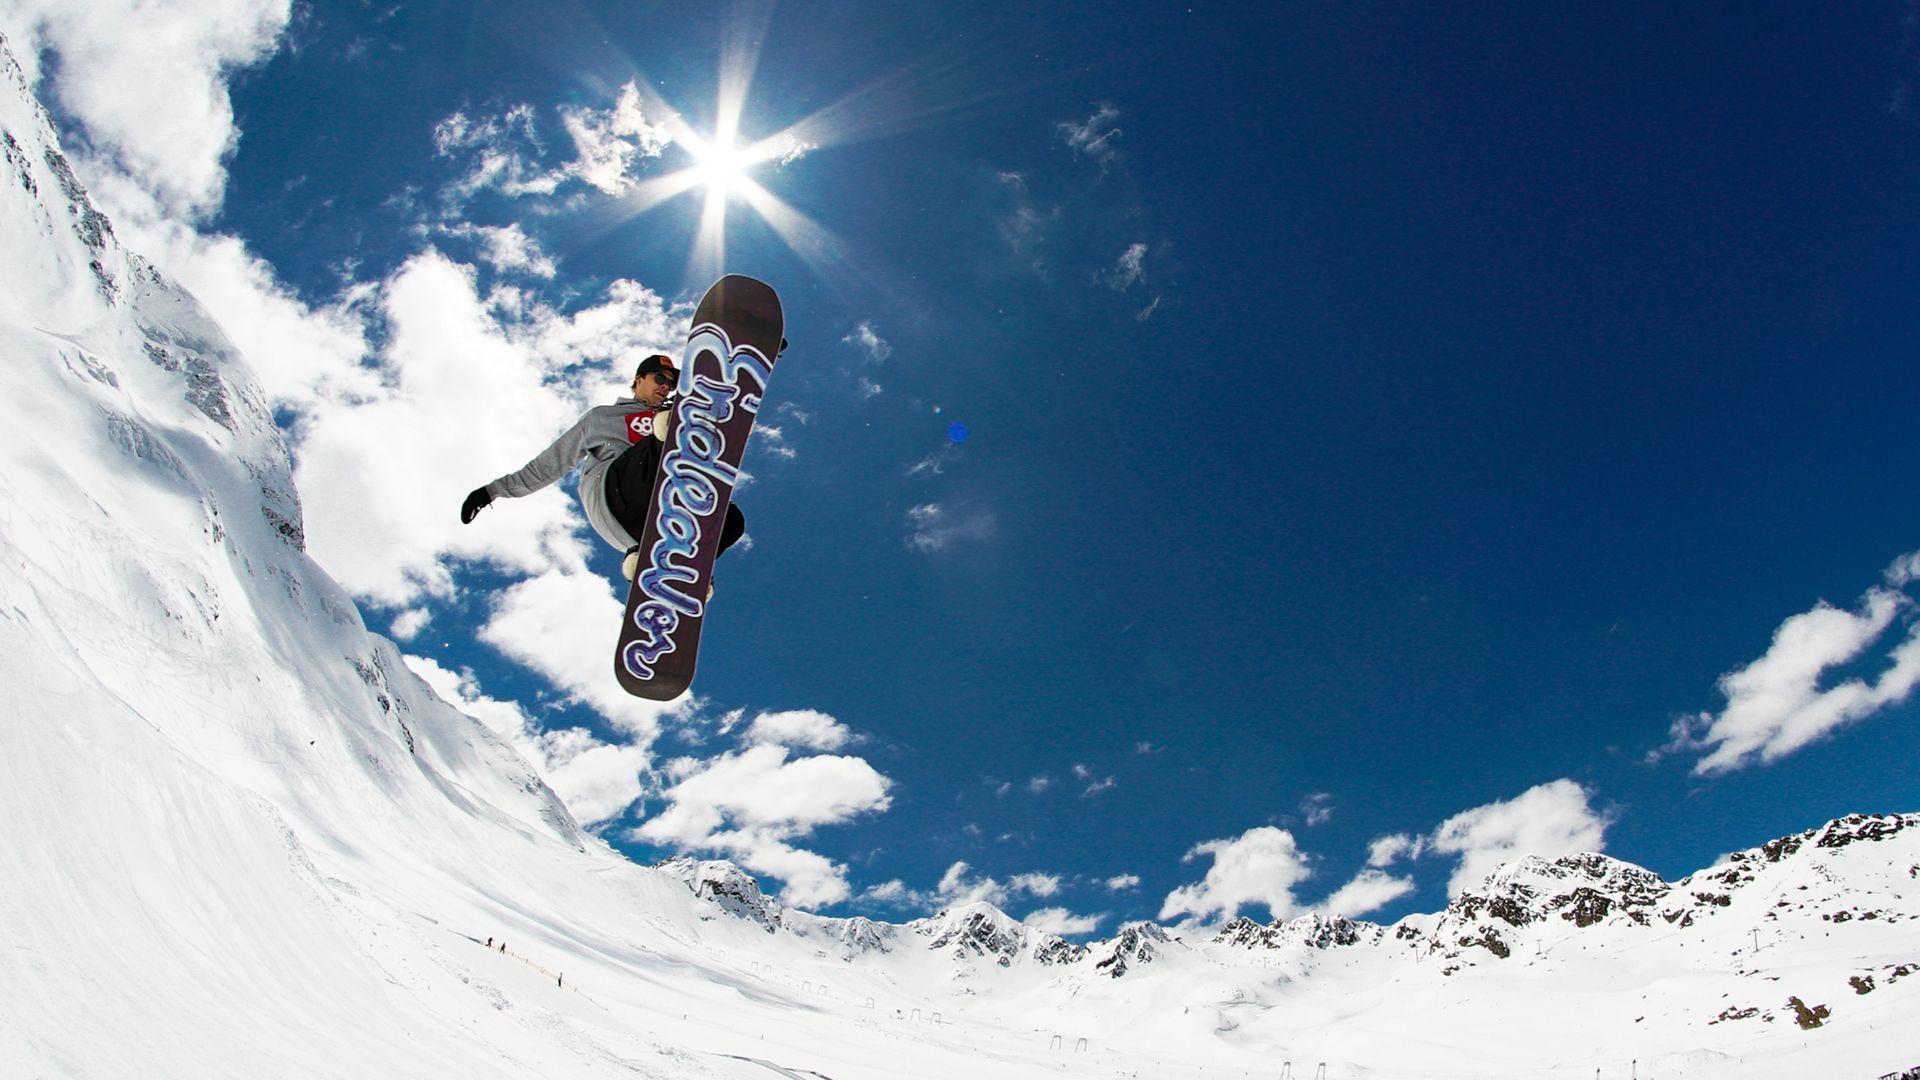 ef1a75af985 Snowboarding Wallpapers - Top Free Snowboarding Backgrounds ...